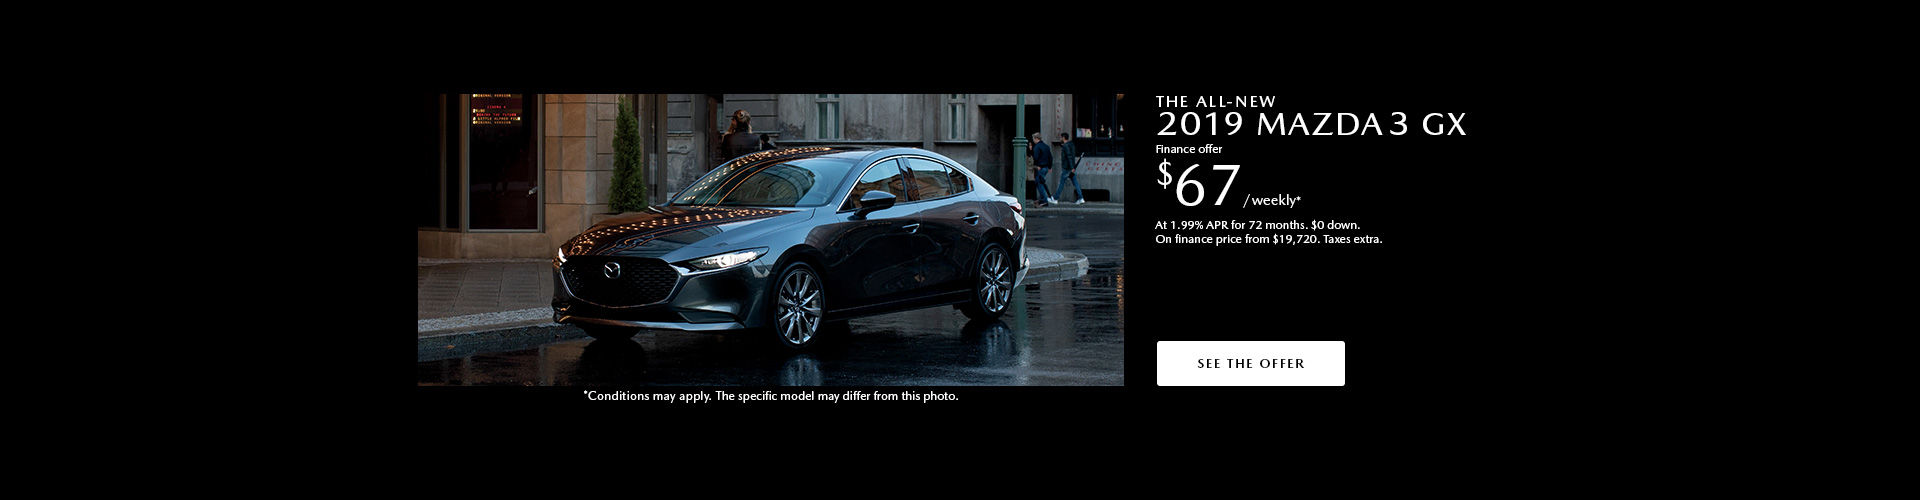 Mazda3 - headers